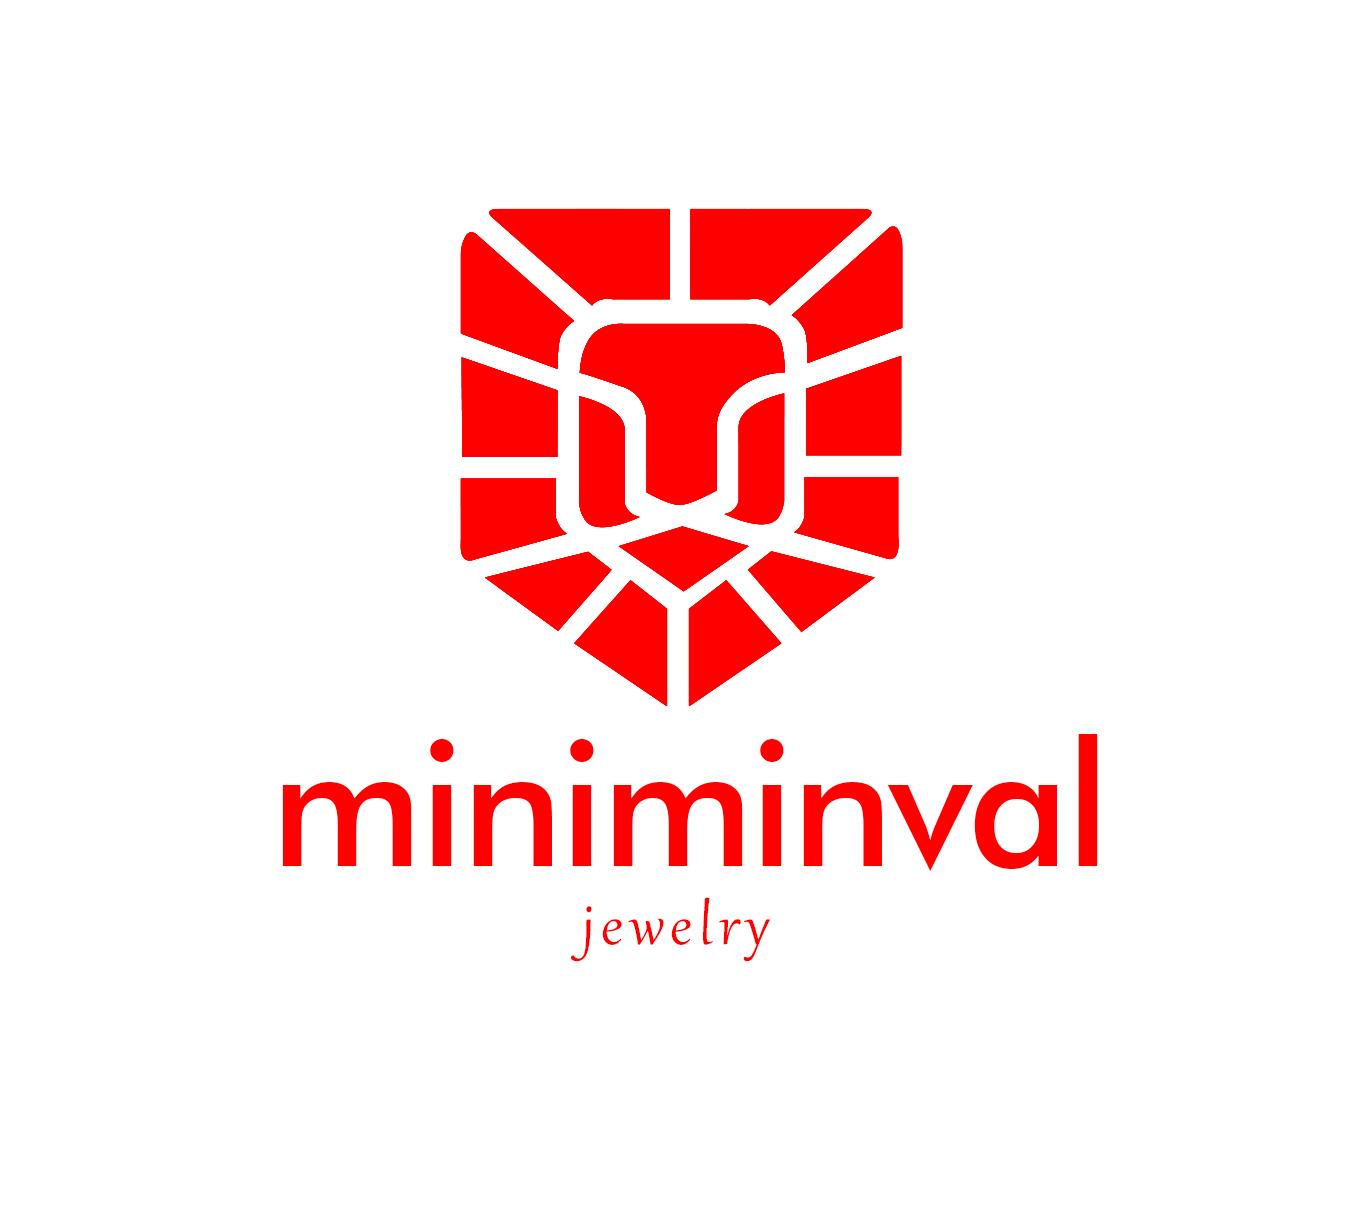 miniminval.com